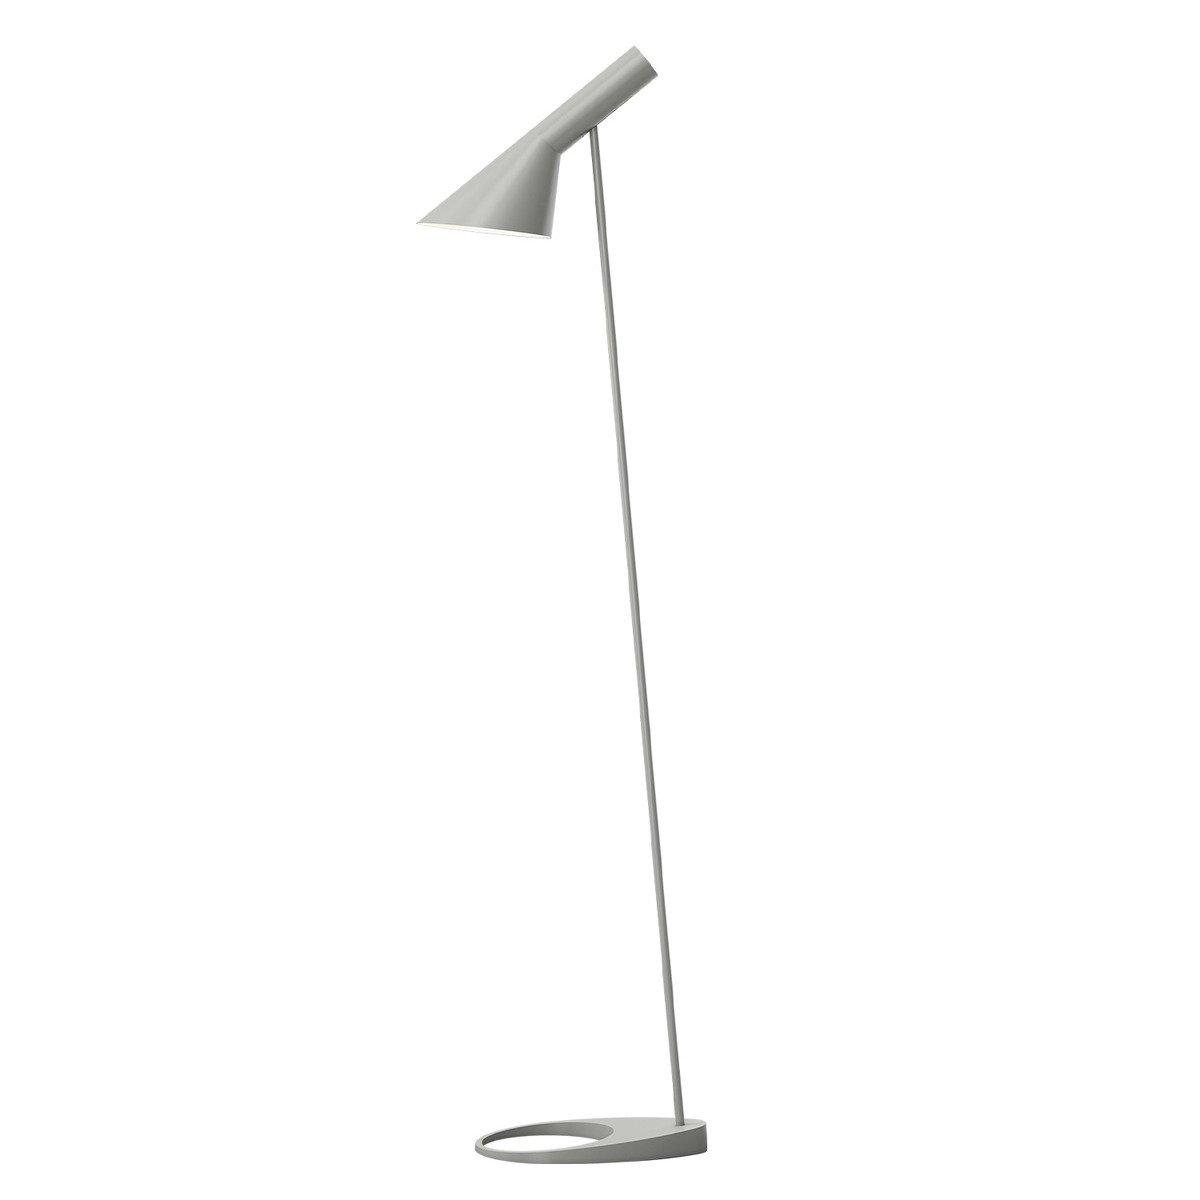 Louis Poulsen Aj Floor Lamp, Original Grey